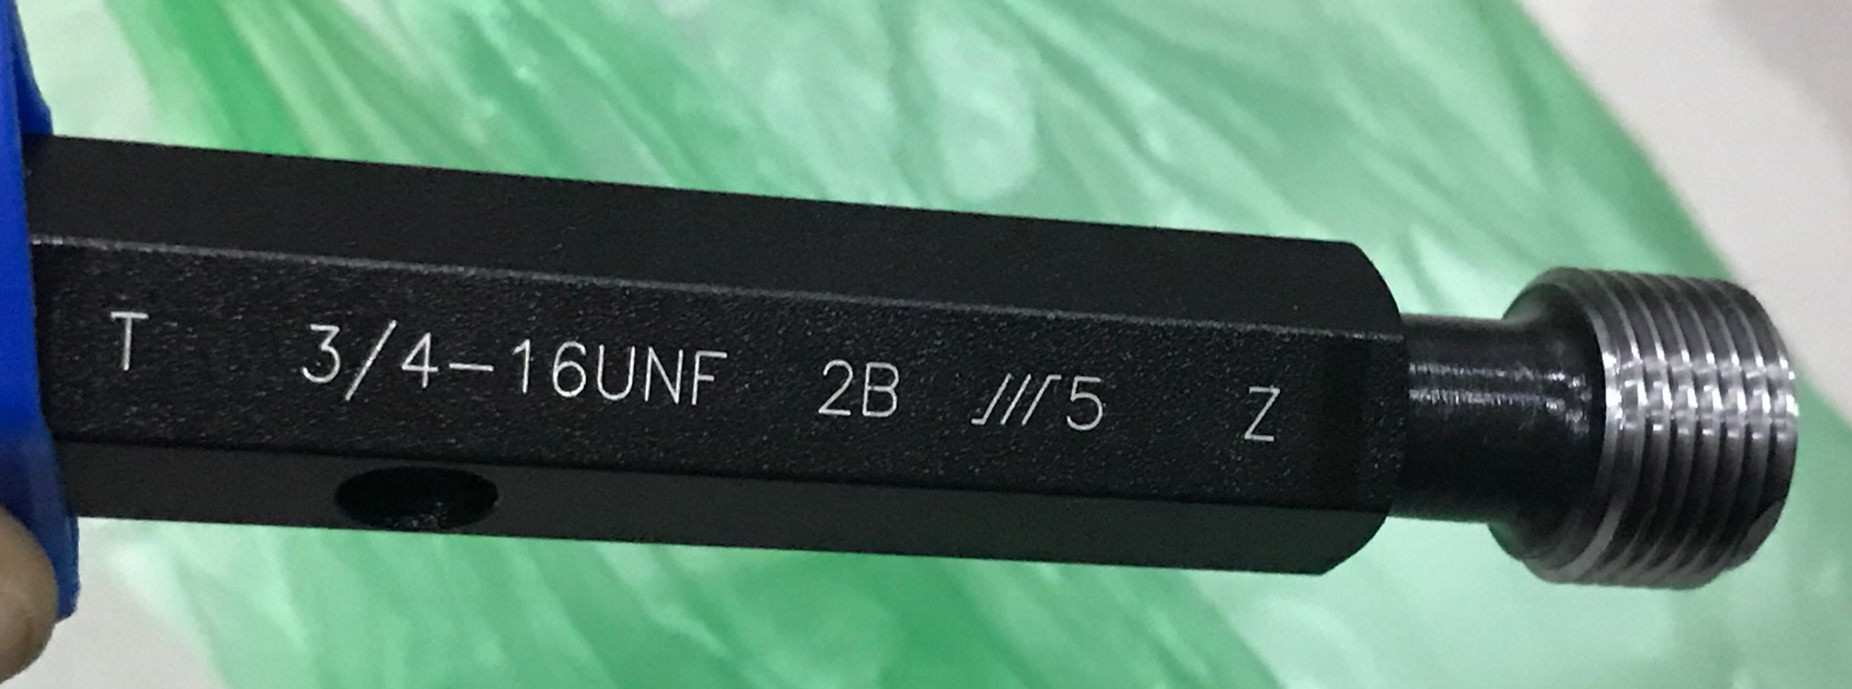 3-4-16 UNF plug gage